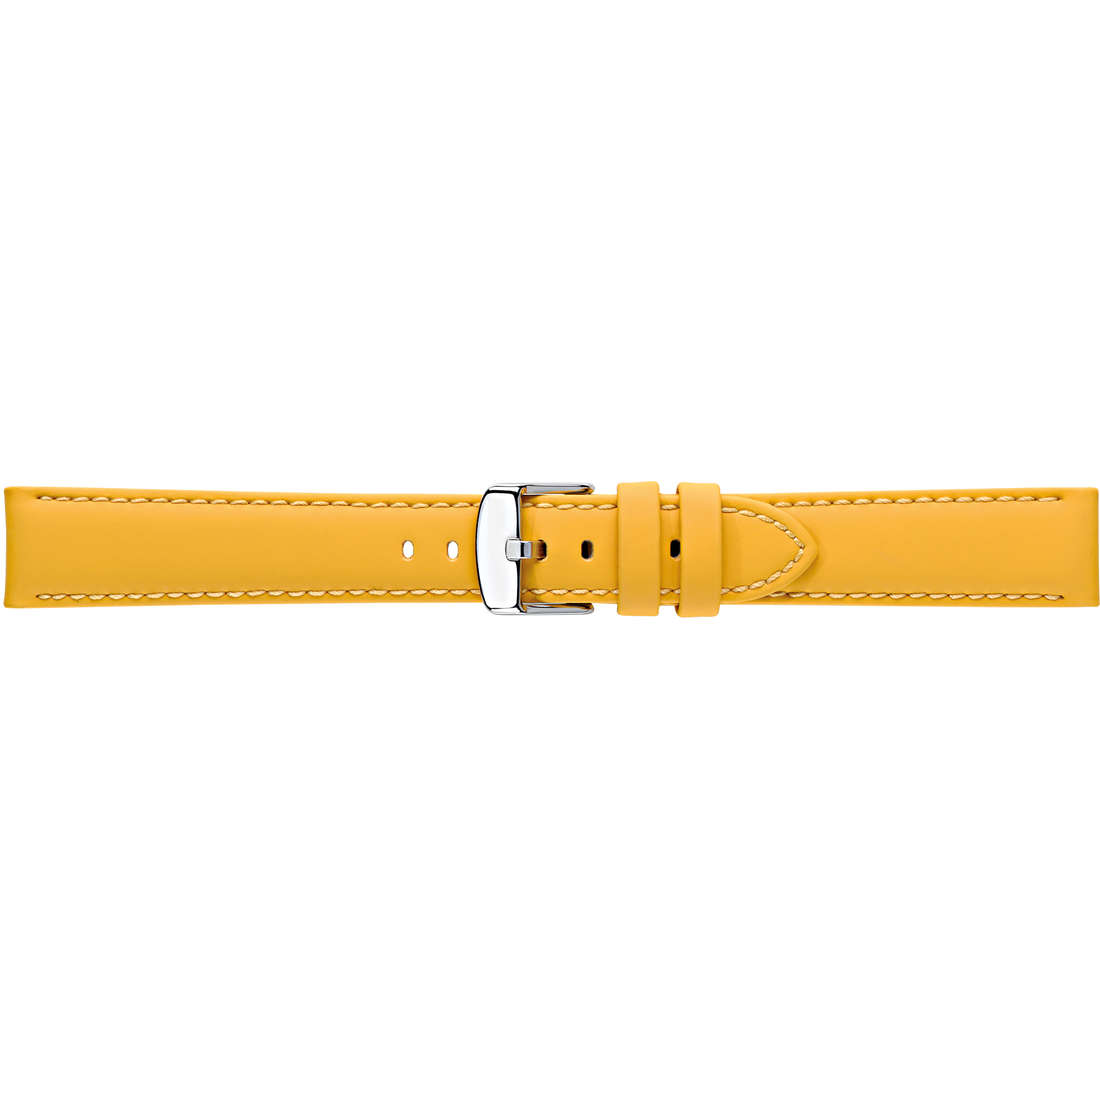 watch watch bands watch straps man Morellato Linea Sport A01U3595A04097CR22